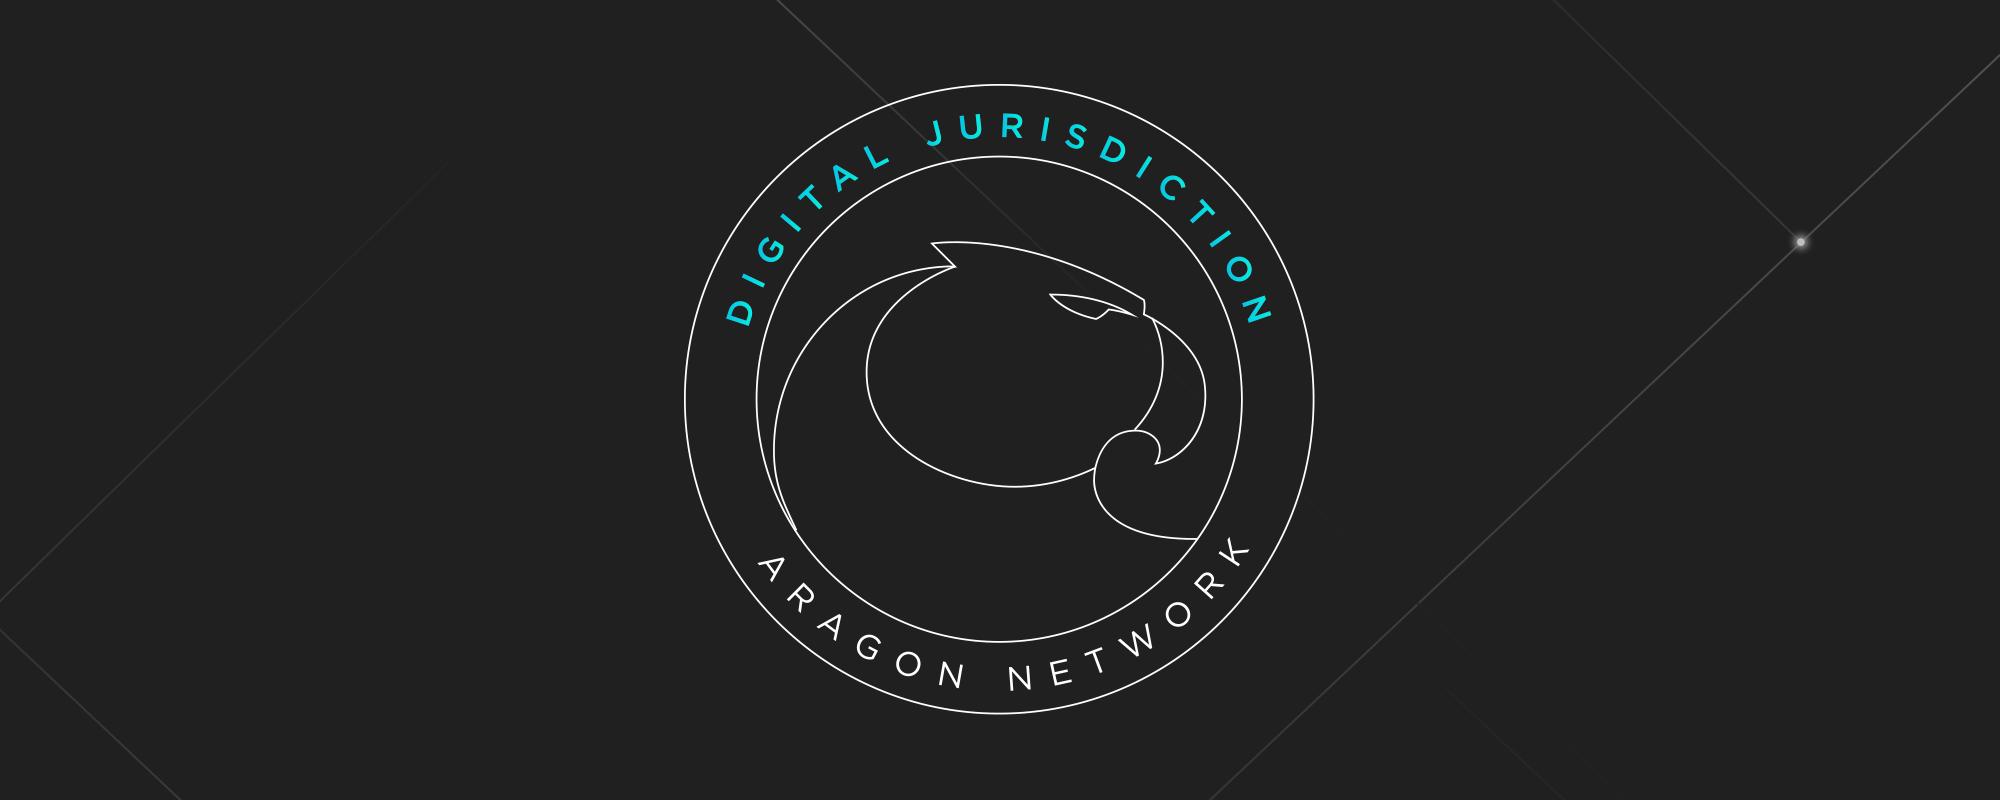 Aragon Network—On a path towards a digital jurisdiction